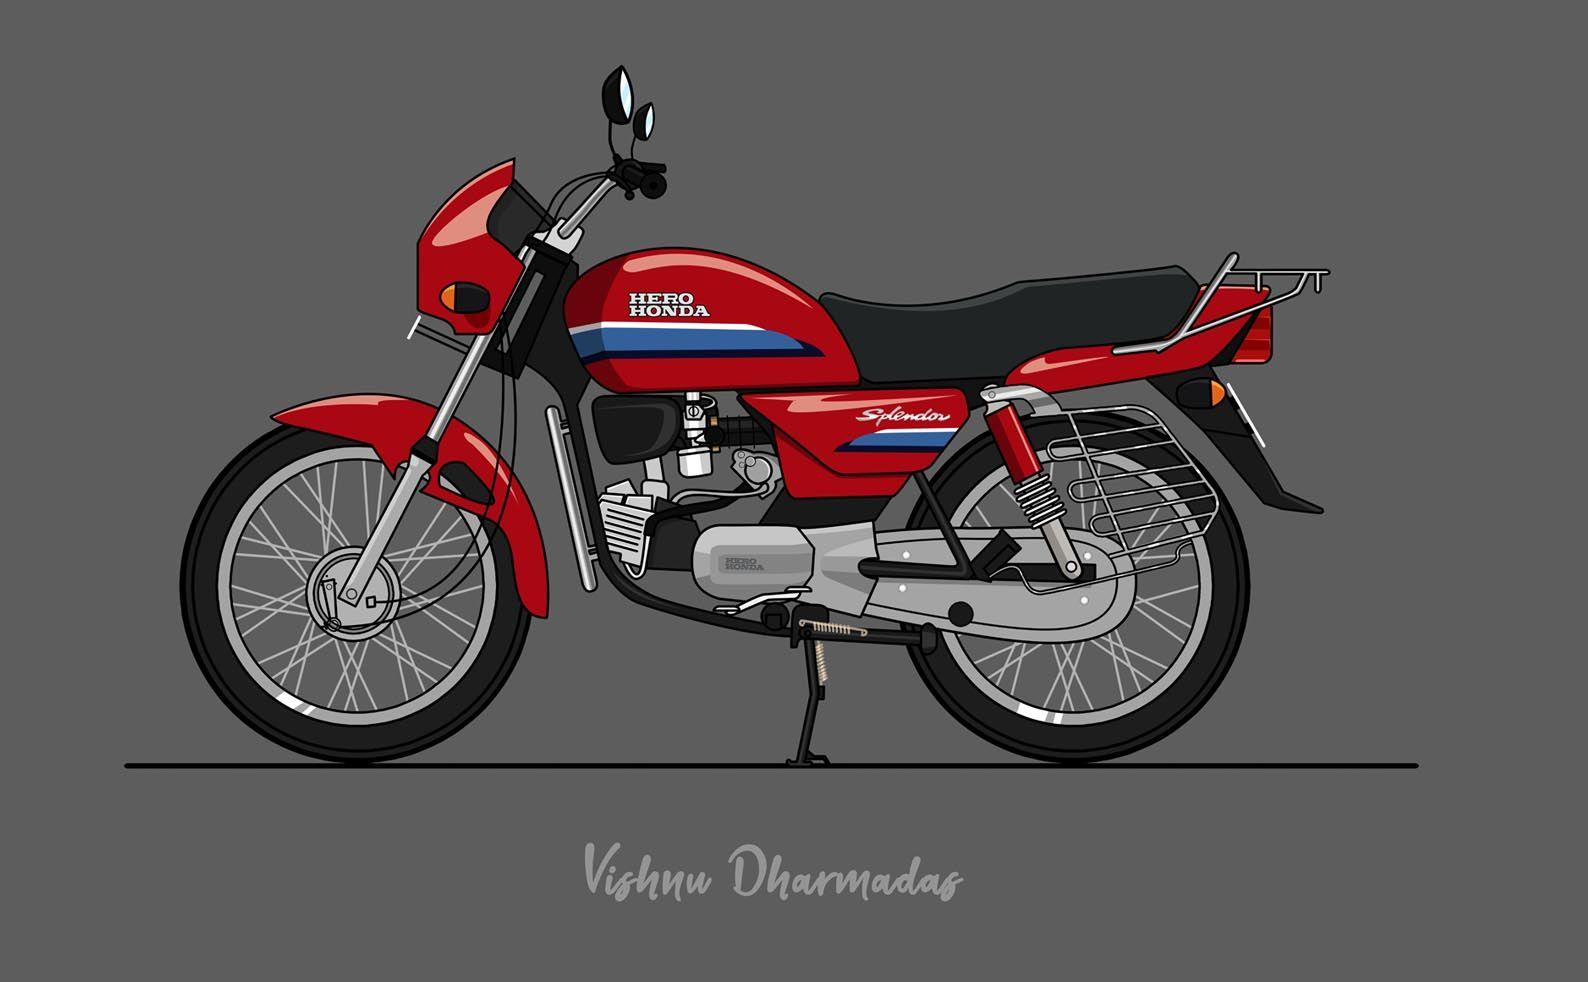 Hero Honda Splendor Is A 1994 Model Indian Motor Cycle